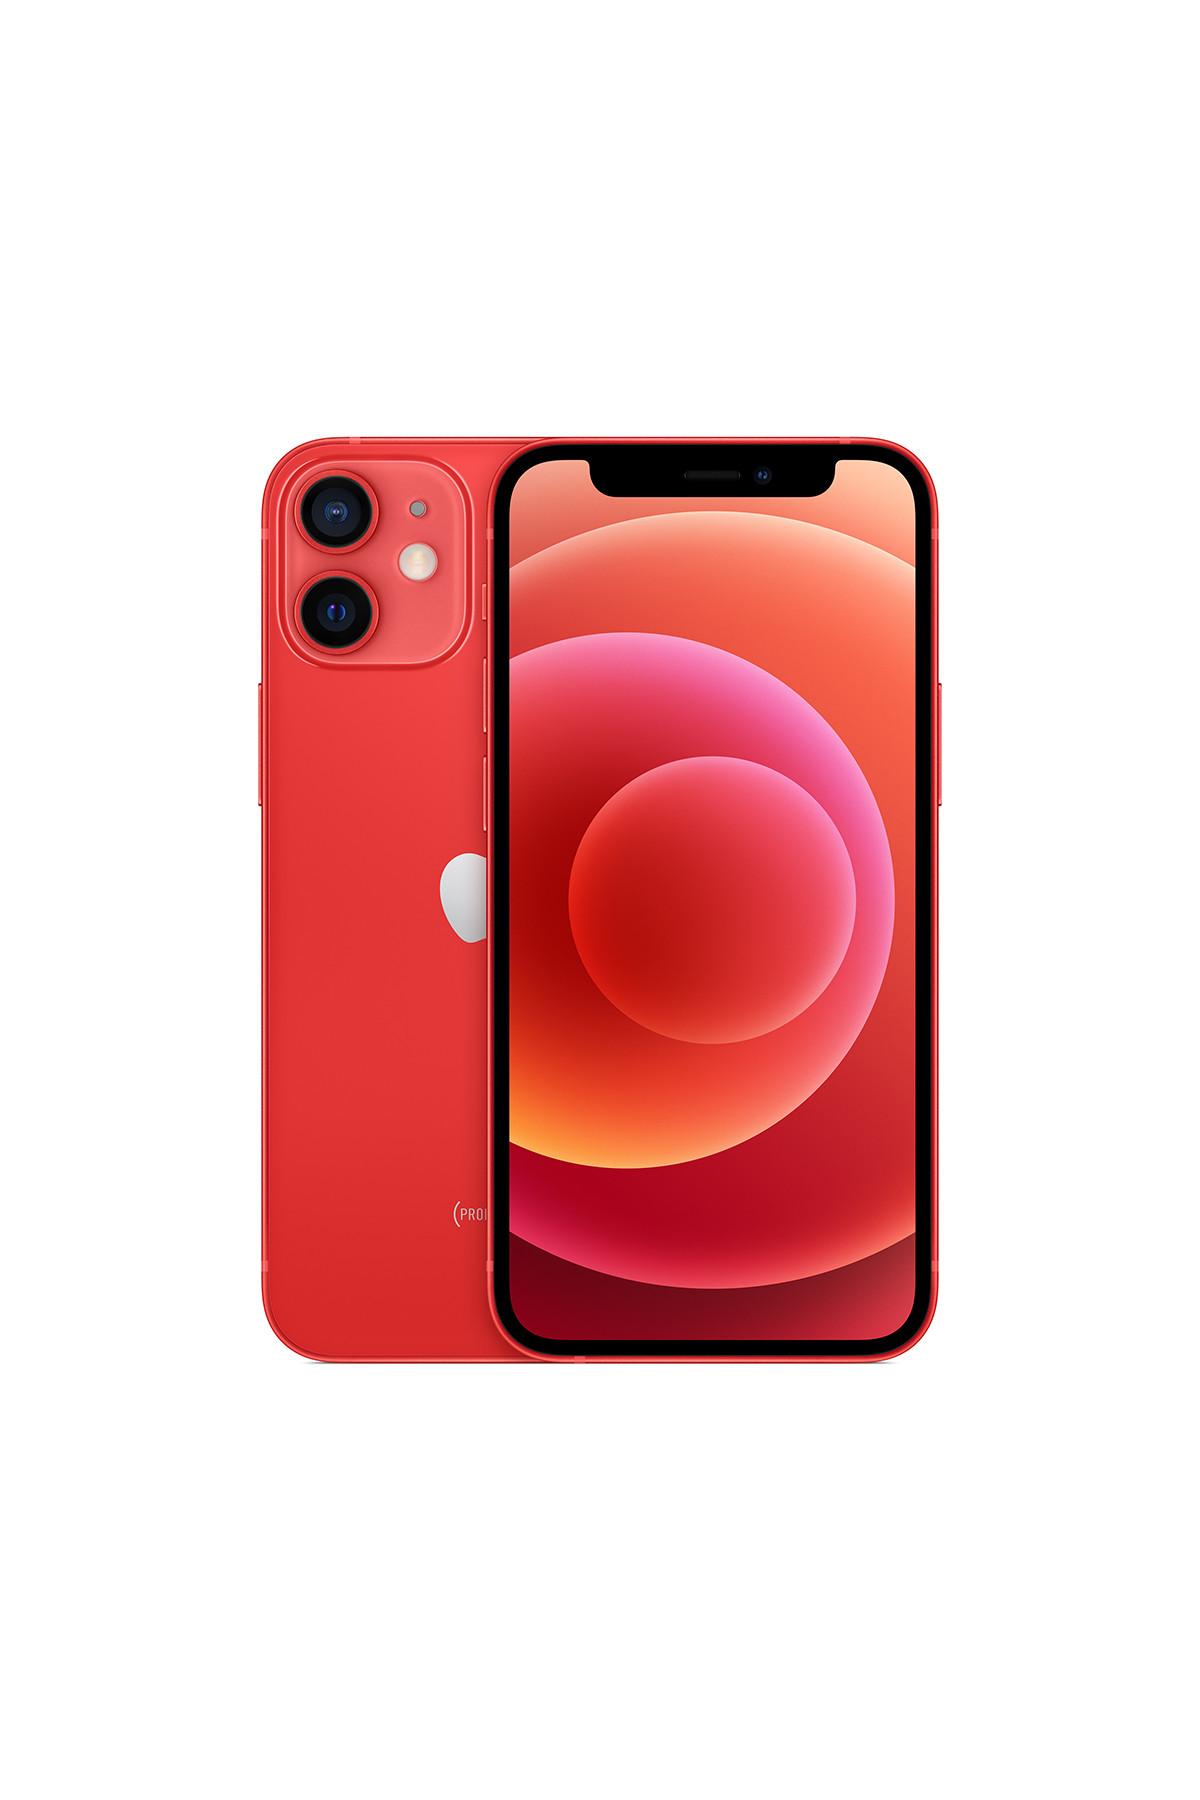 iPhone 12 Mini 128GB - PRODUCT(RED)